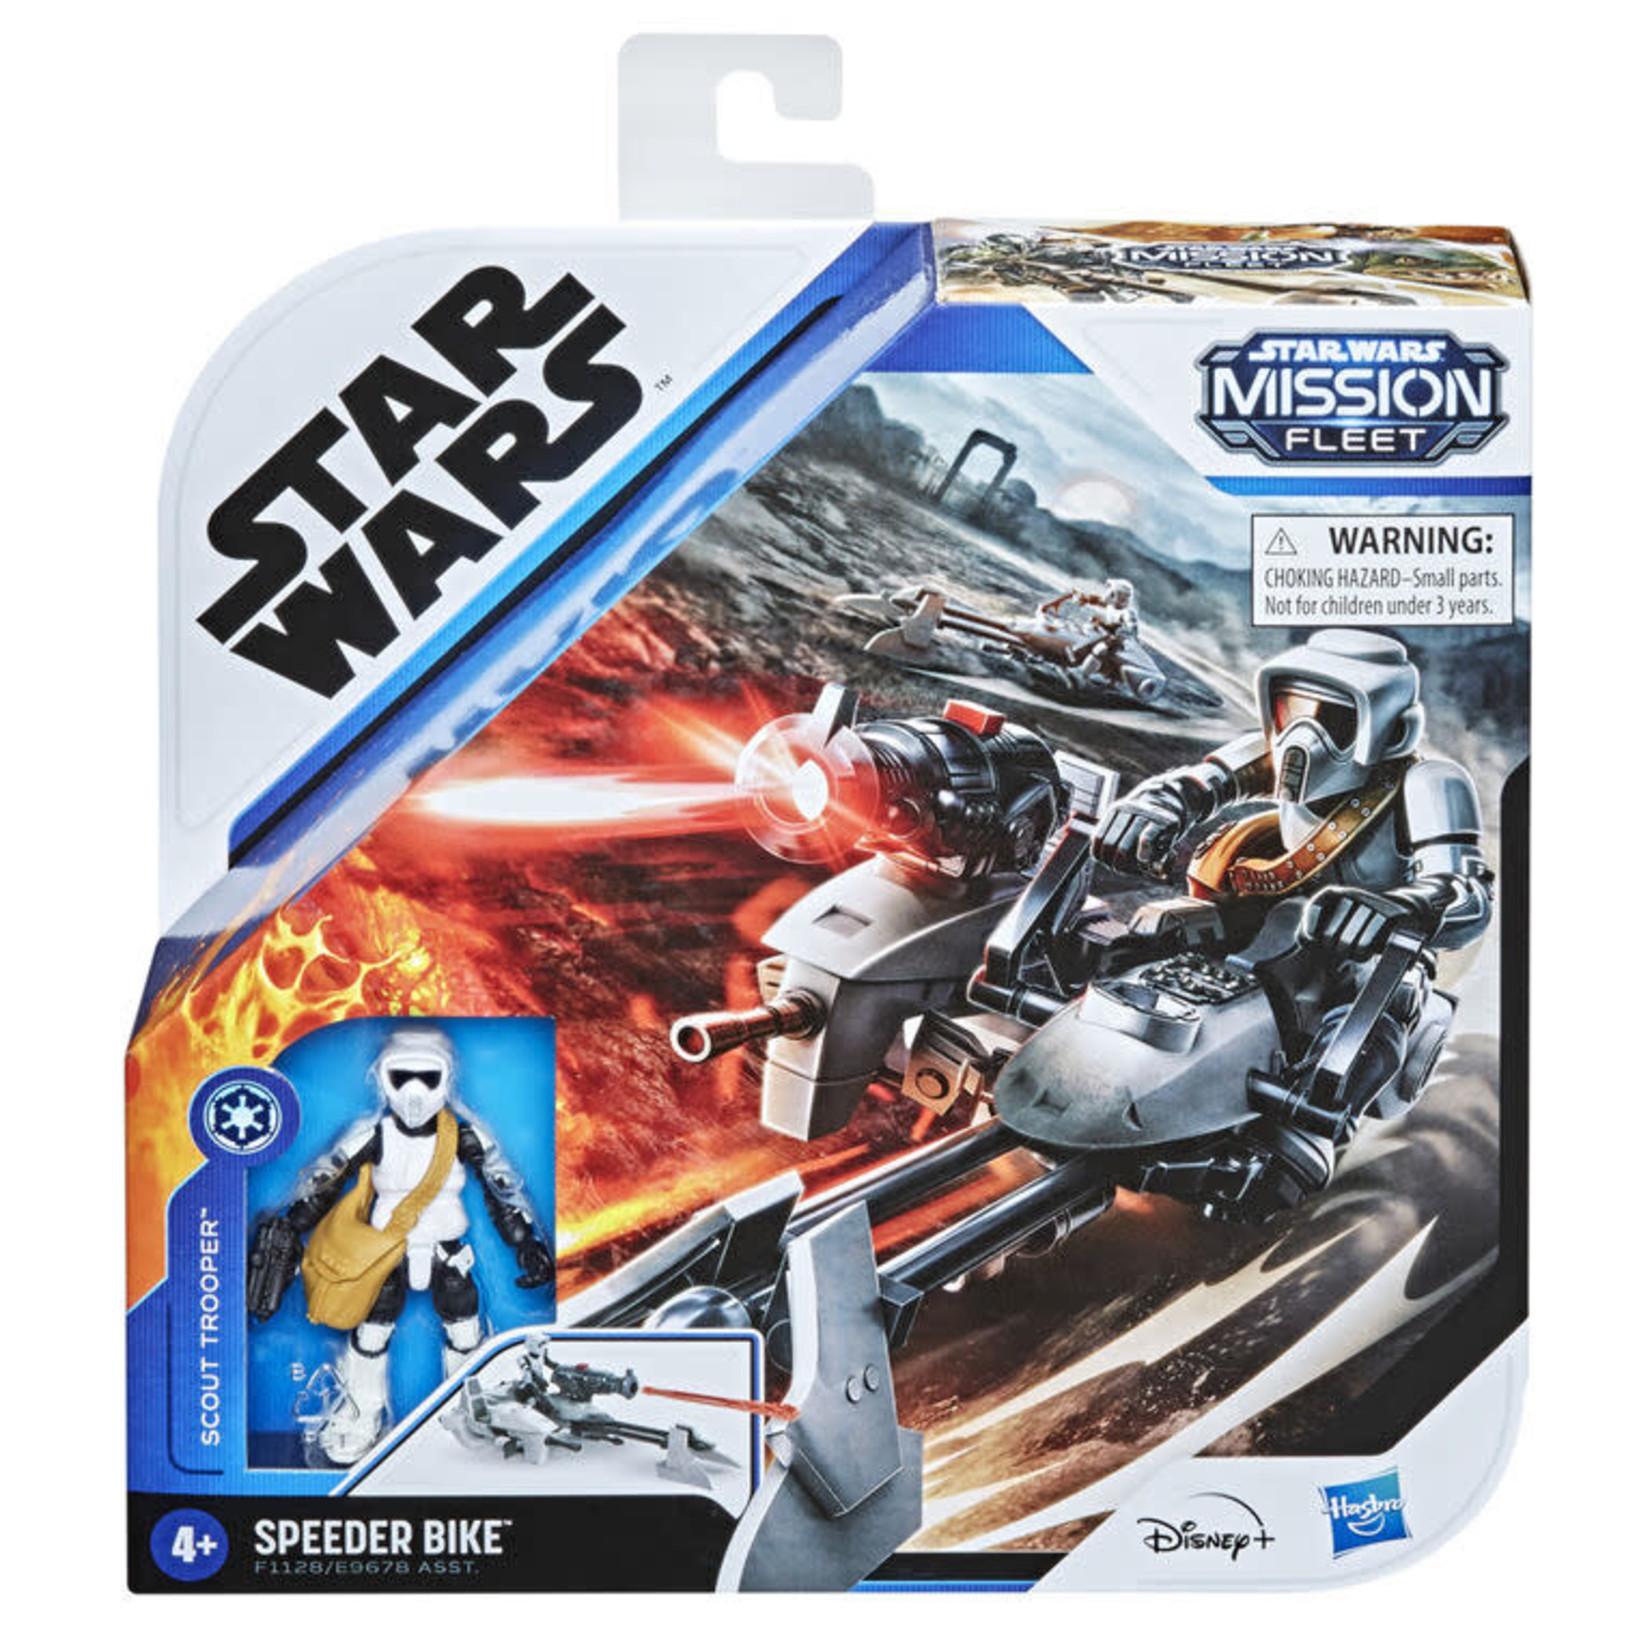 Hasbro Copy of Star Wars Mission Fleet Expedition Class - The Mandalorian et Speedder bike